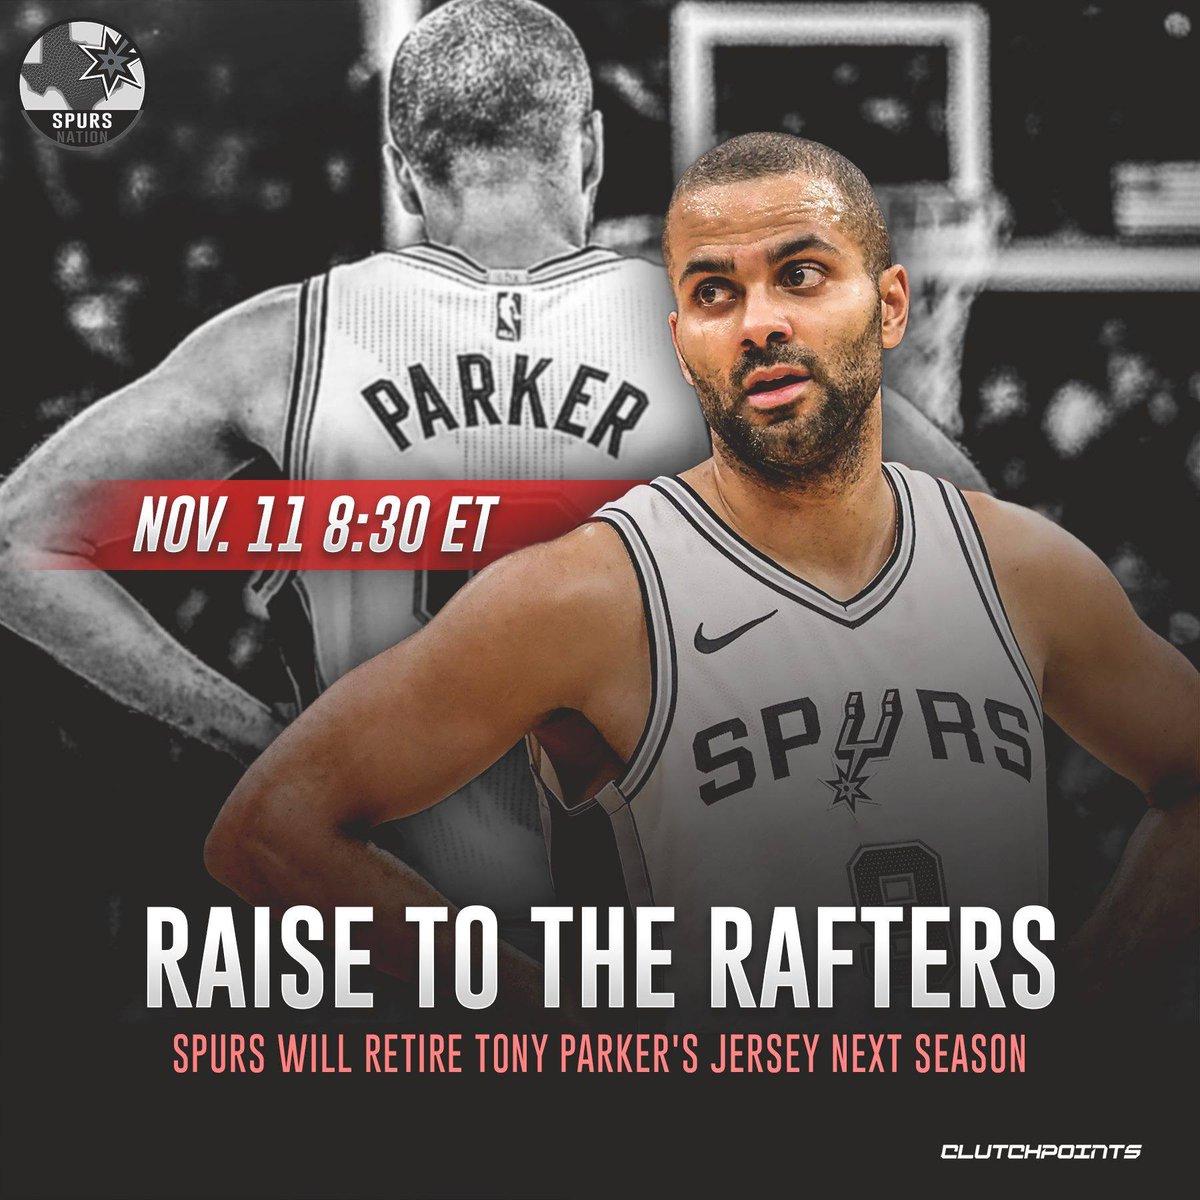 Get your tickets #Spurs fans to honor future HOF Tony Parker   #Gospursgo <br>http://pic.twitter.com/J8njg92cHX